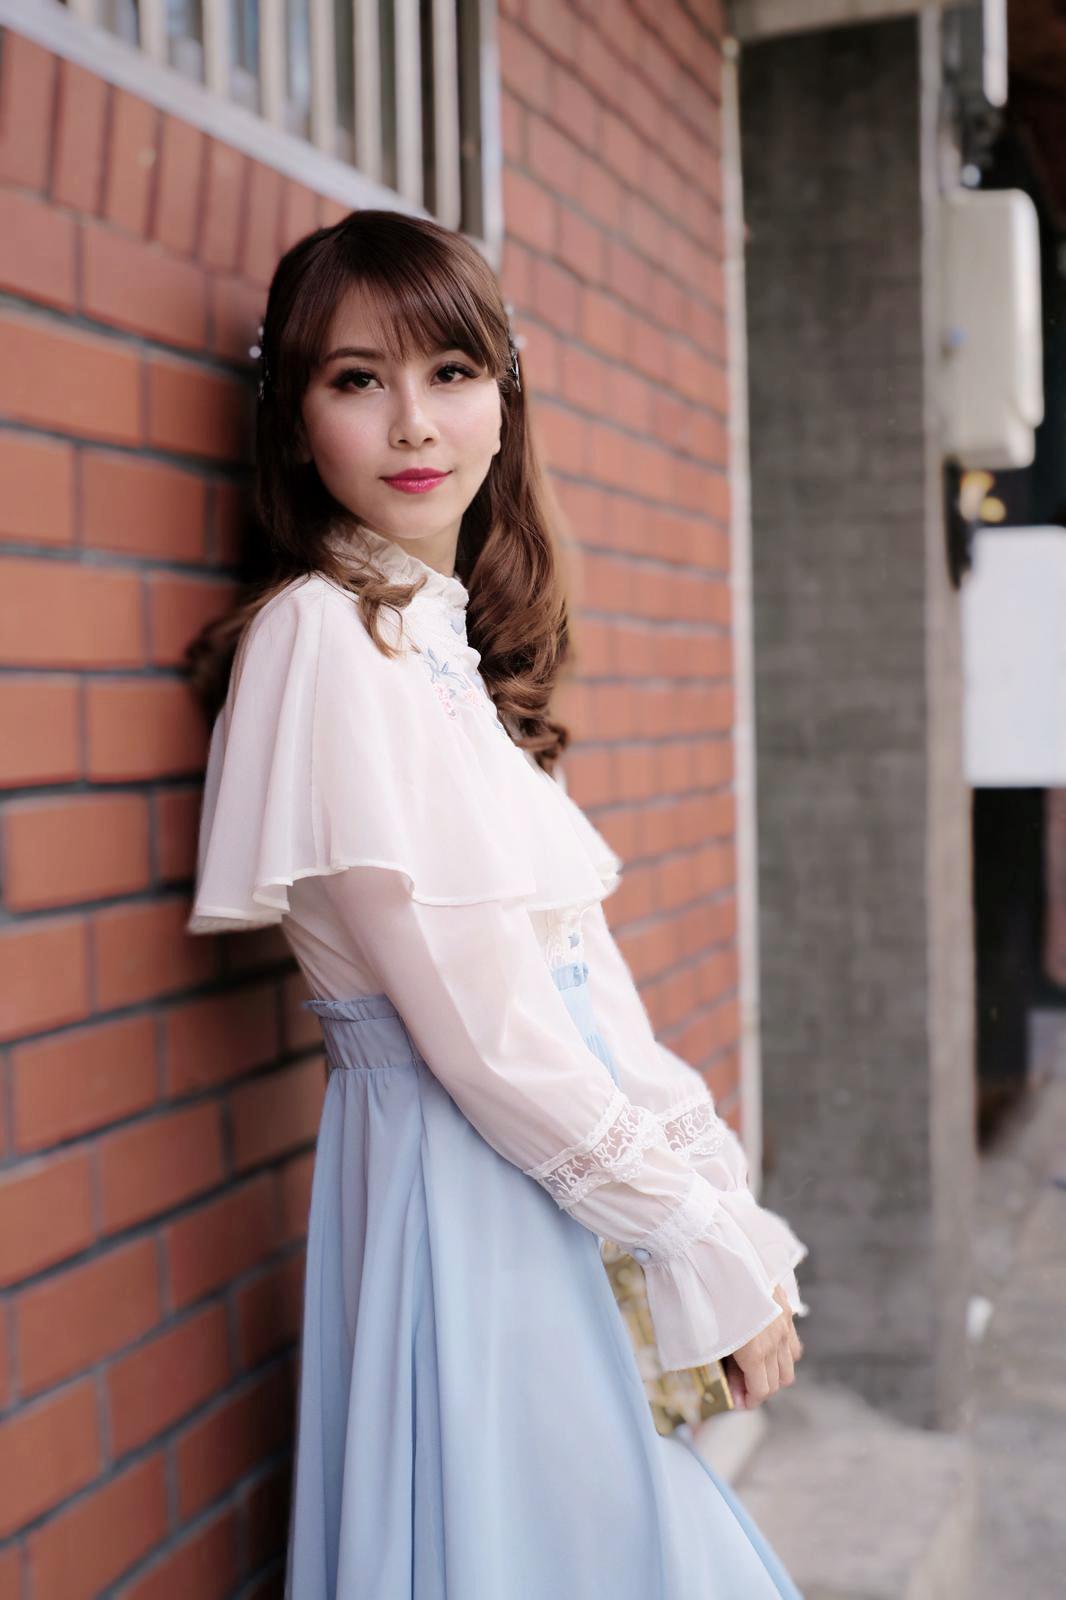 Vintage Clothes Rental Seoul Korea Ikseon Boutique Hotel Del Luna Inspired 6